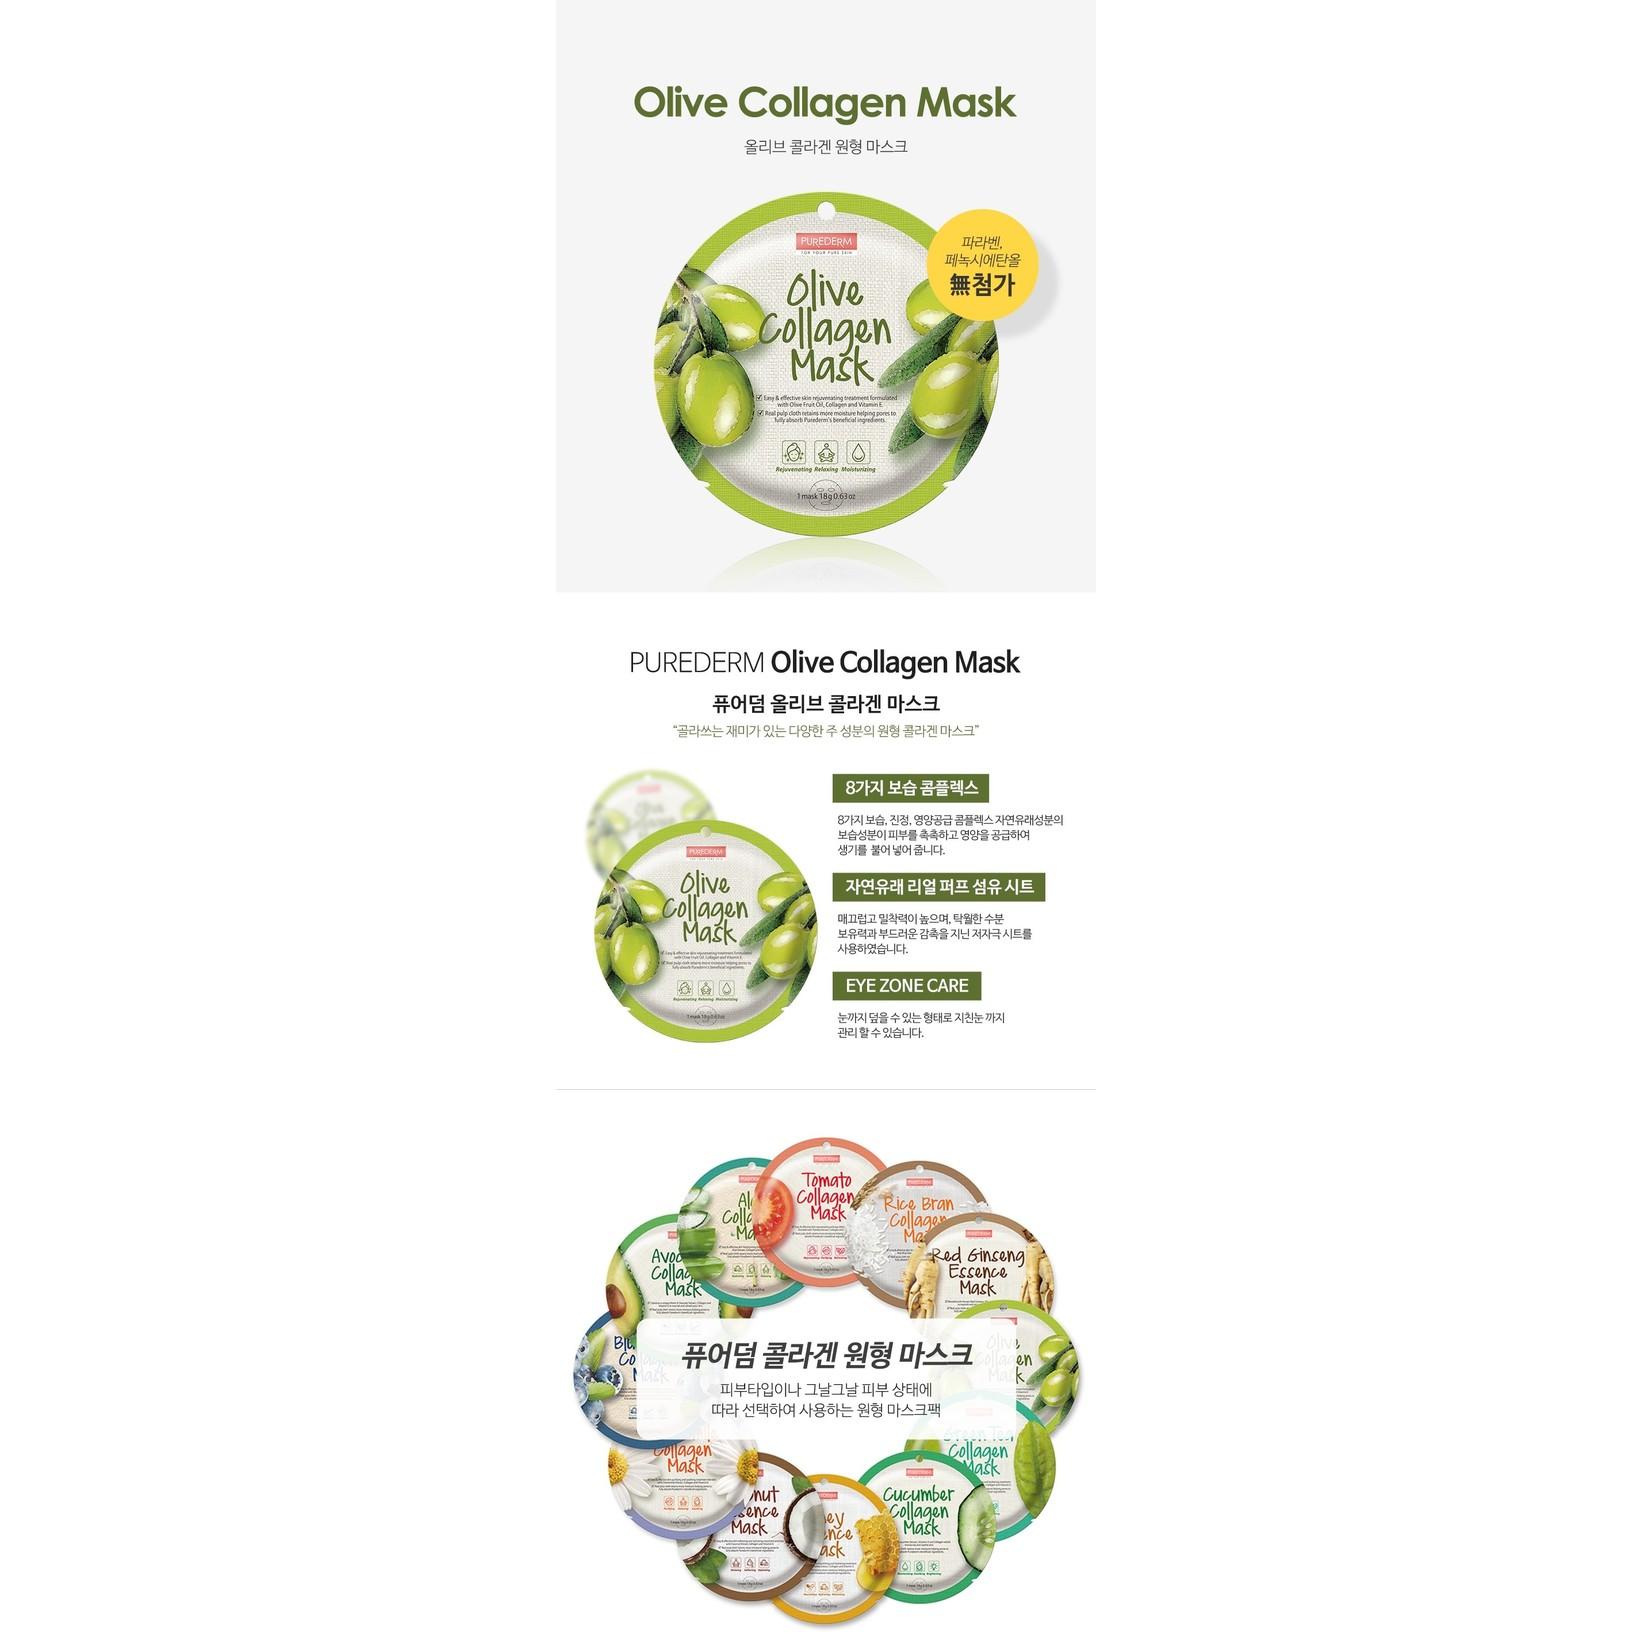 PUREDERM Circle Mask - Olive Collagen